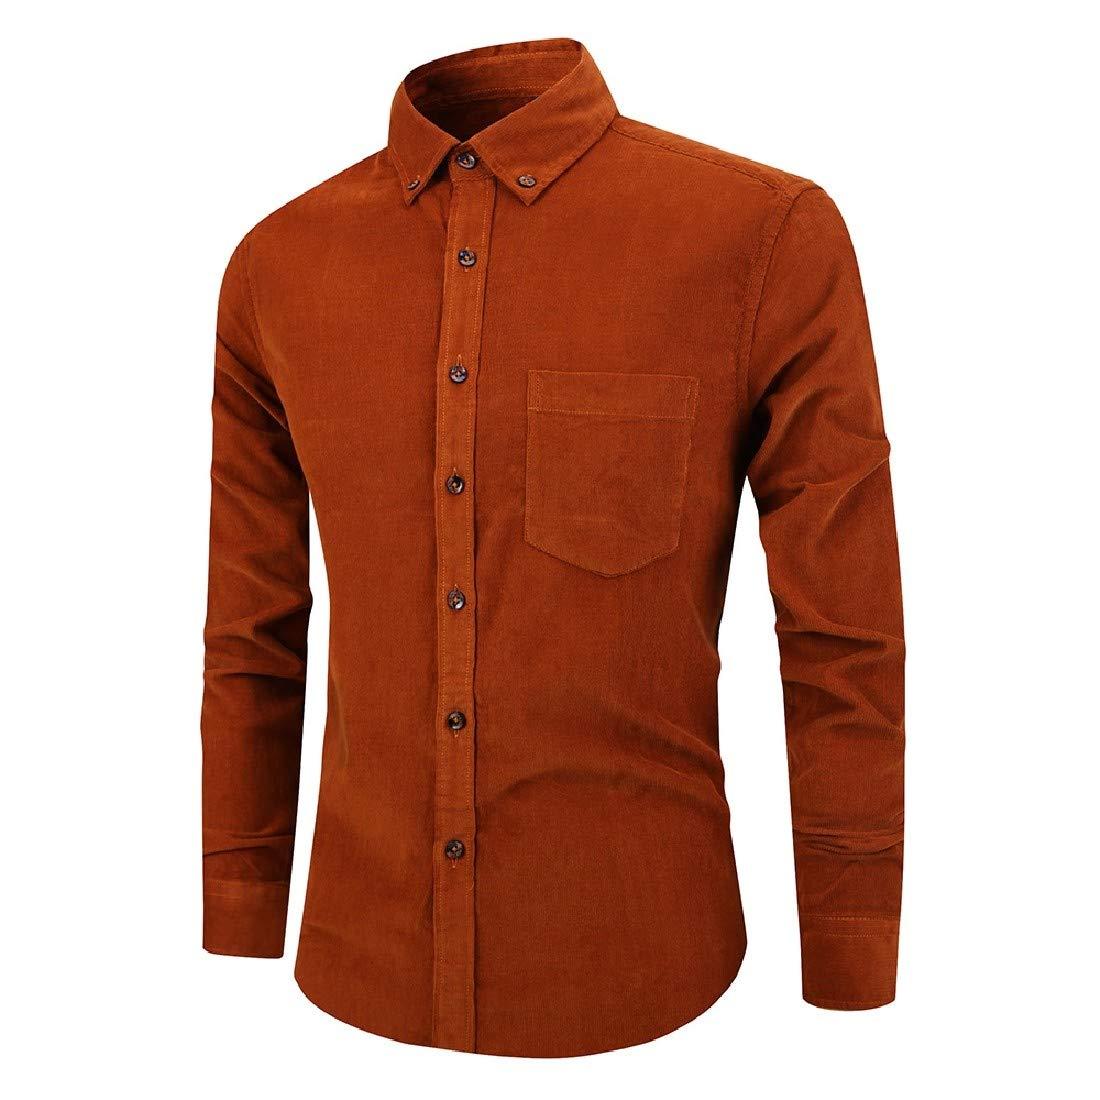 YUNY Men Corduroy Solid Color Long-Sleeve Buttoned Retrol T-Shirts Shirts AS1 XXS